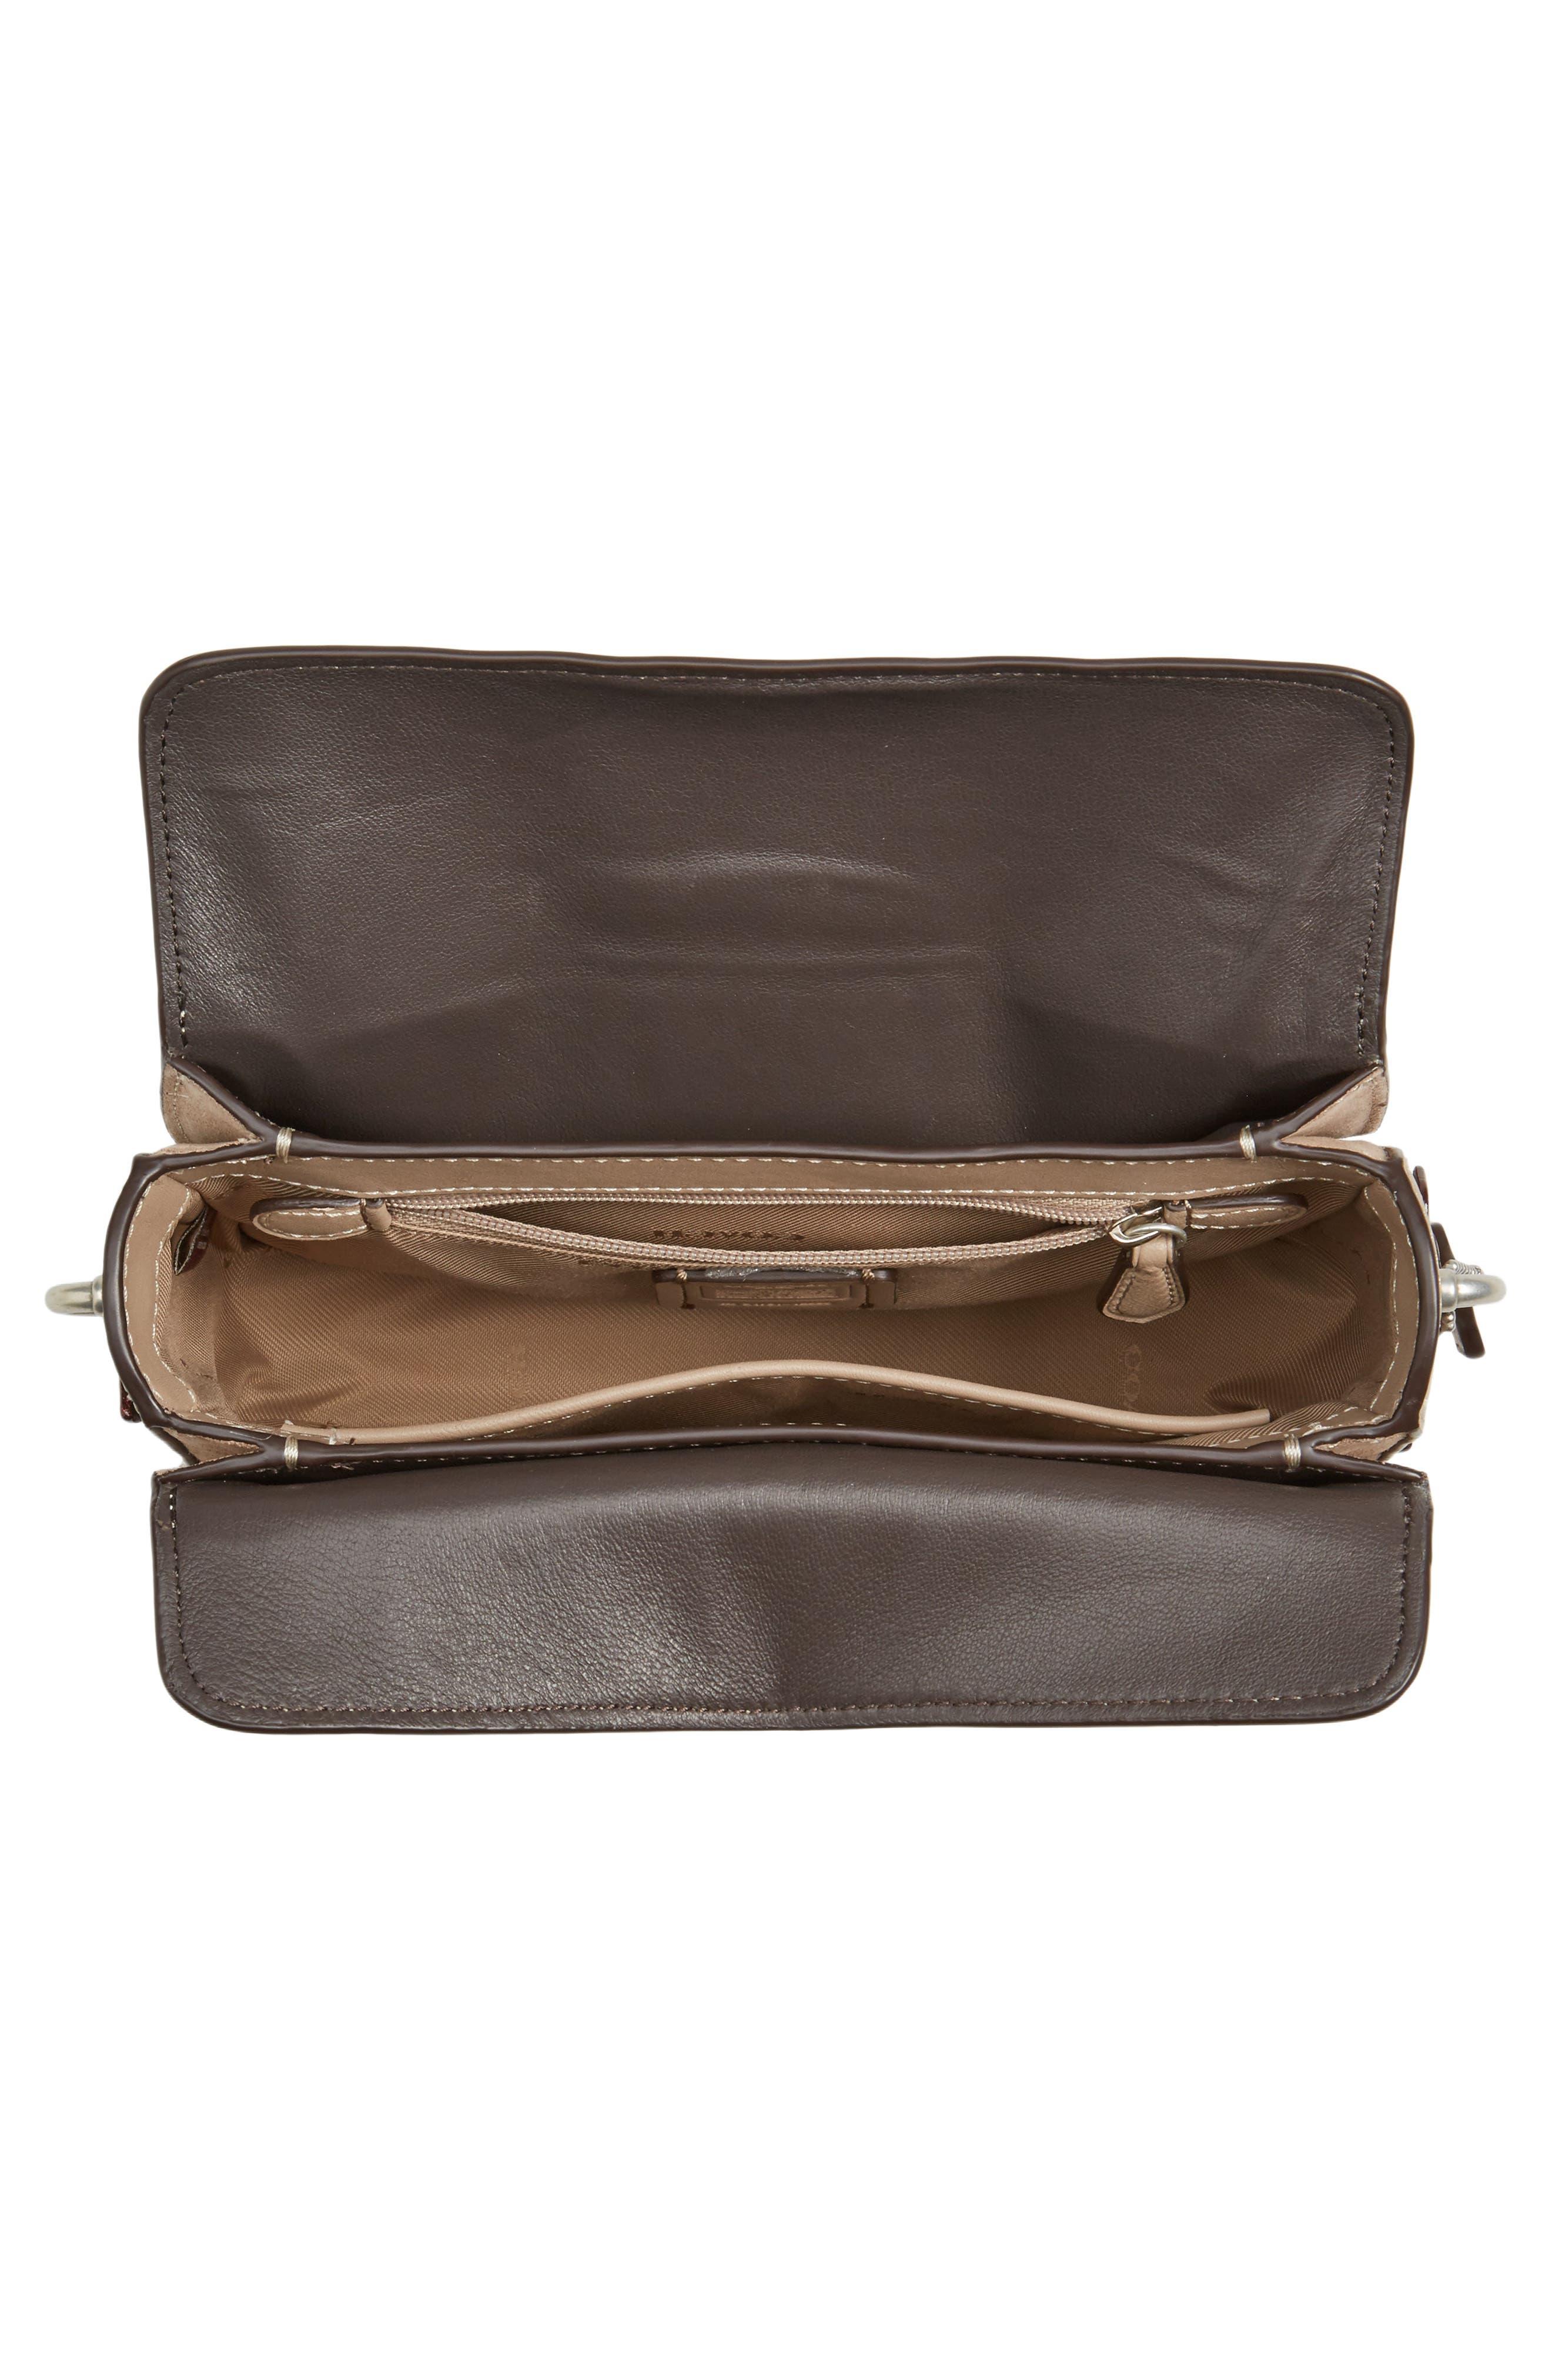 Alternate Image 3  - COACH Page Tea Rose Tooled Calfskin Leather Top Handle Satchel